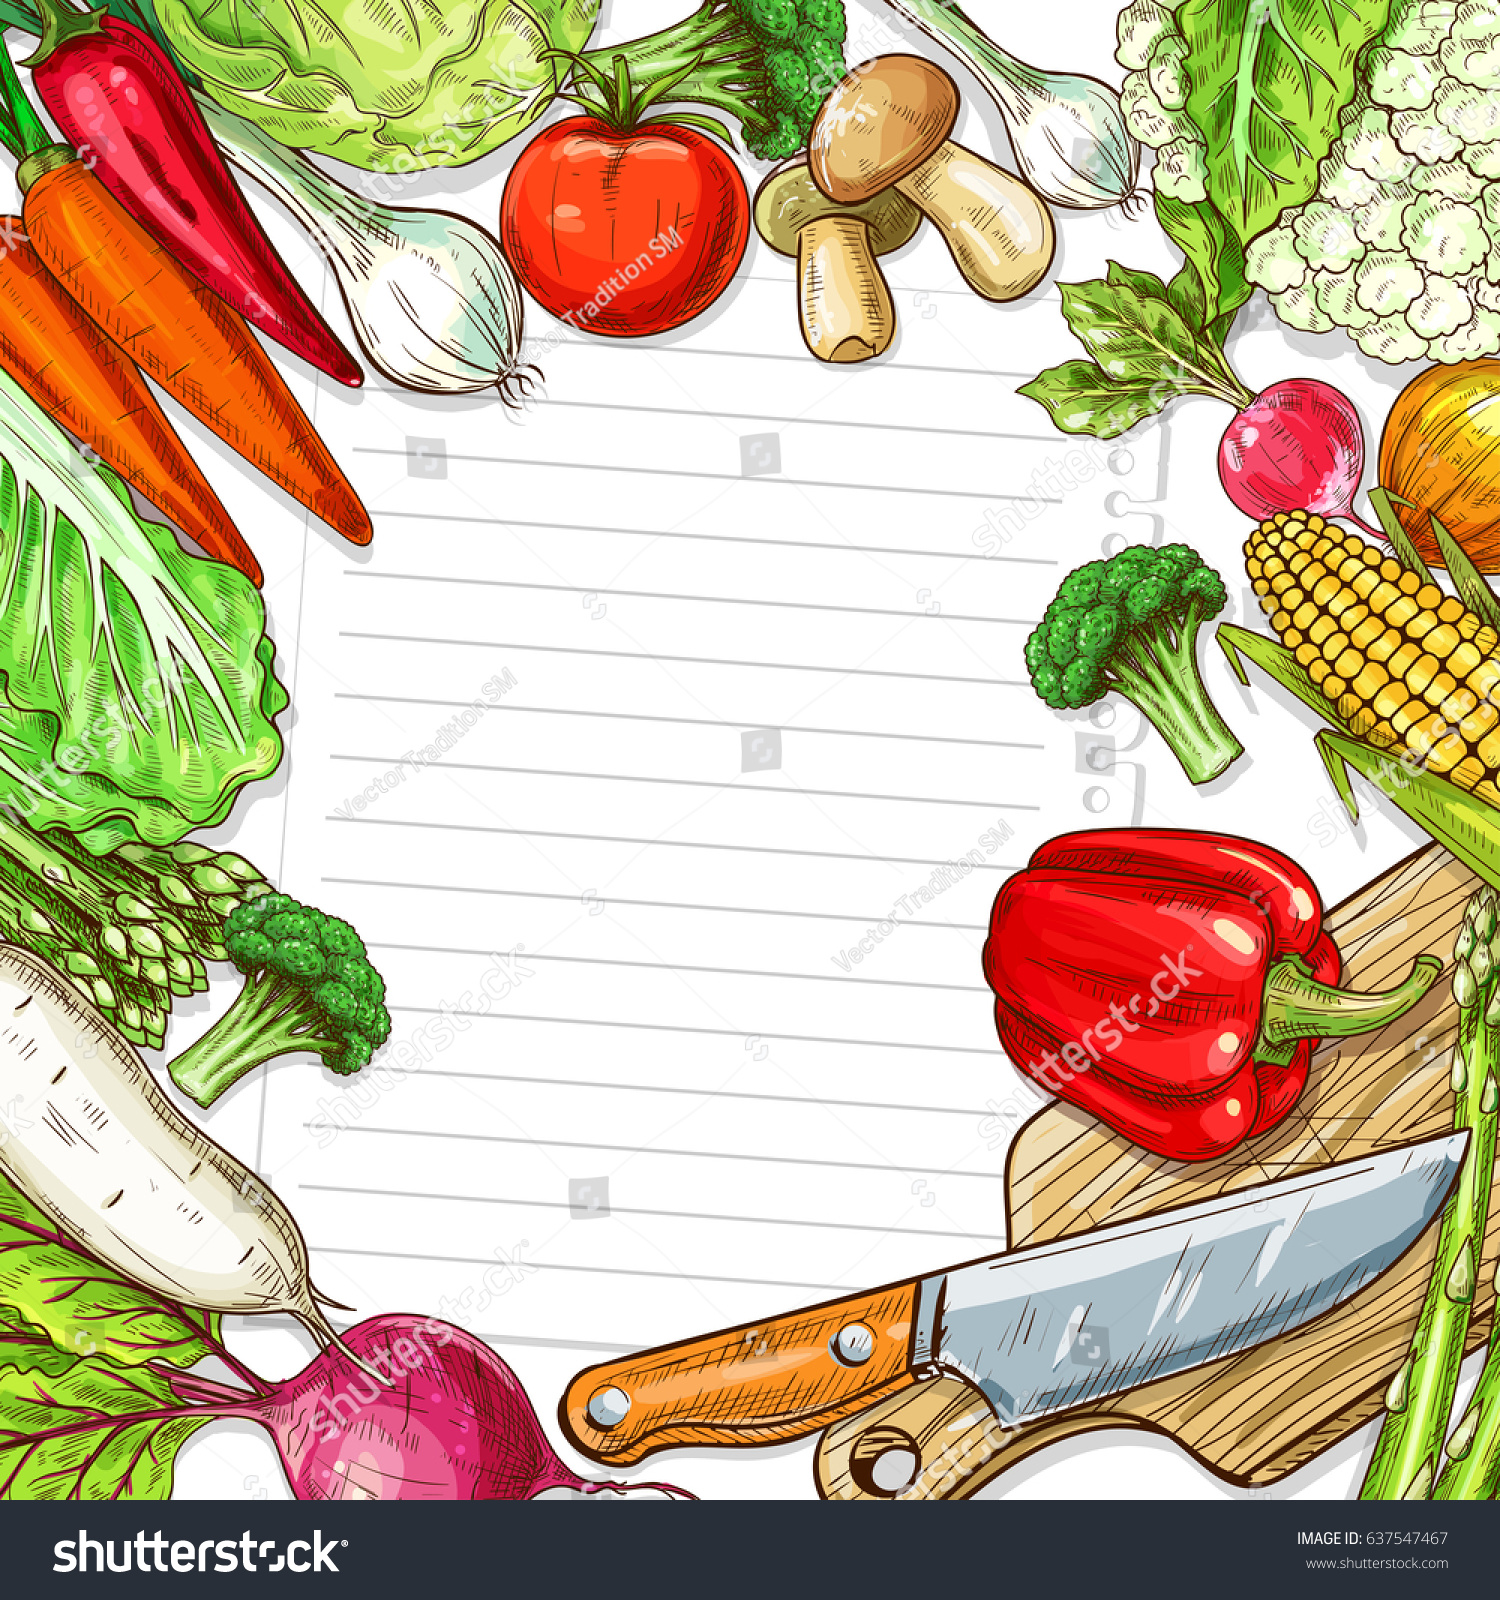 Recipe blank paper note vegetables design vectores en stock recipe blank paper note vegetables design vectores en stock 637547467 shutterstock forumfinder Images